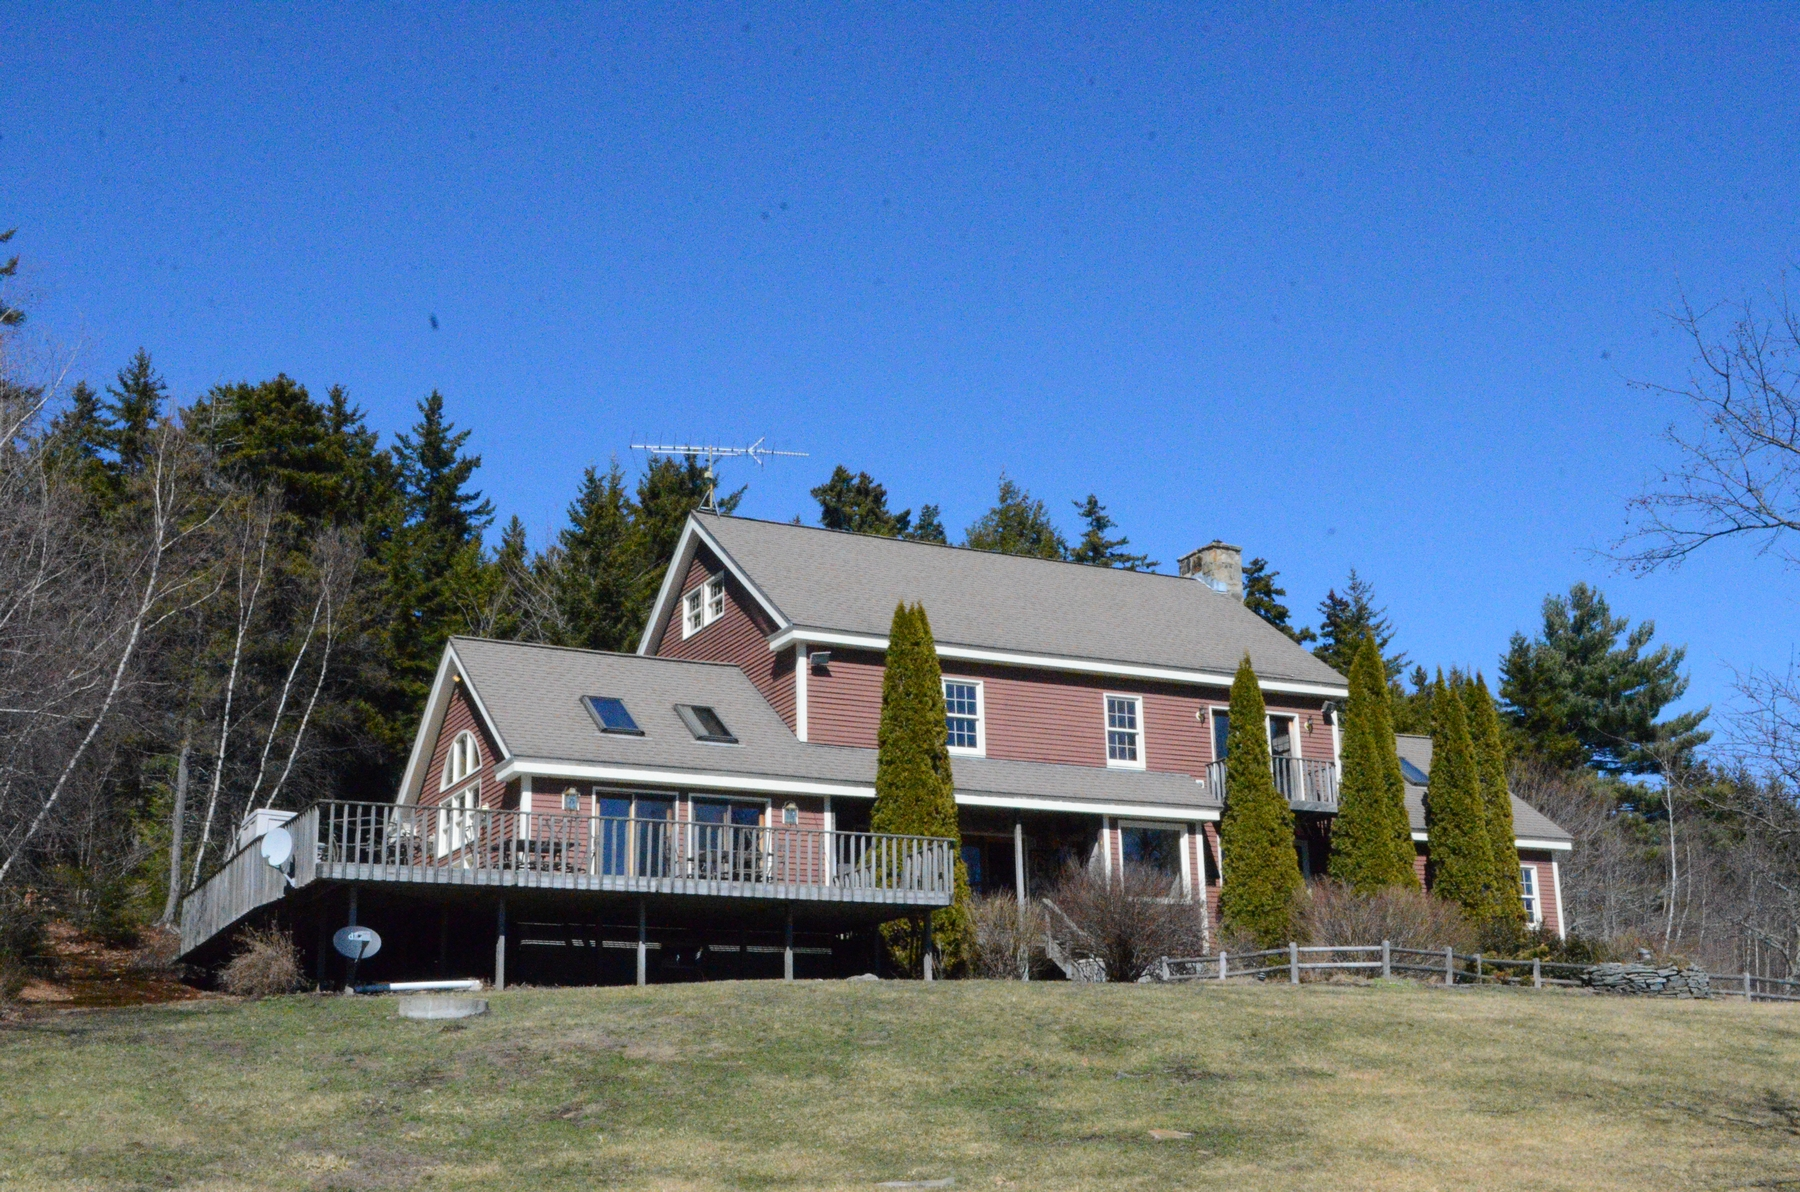 Moradia para Venda às Distinguished Country Estate 845 Hall Halifax, Vermont, 05358 Estados Unidos